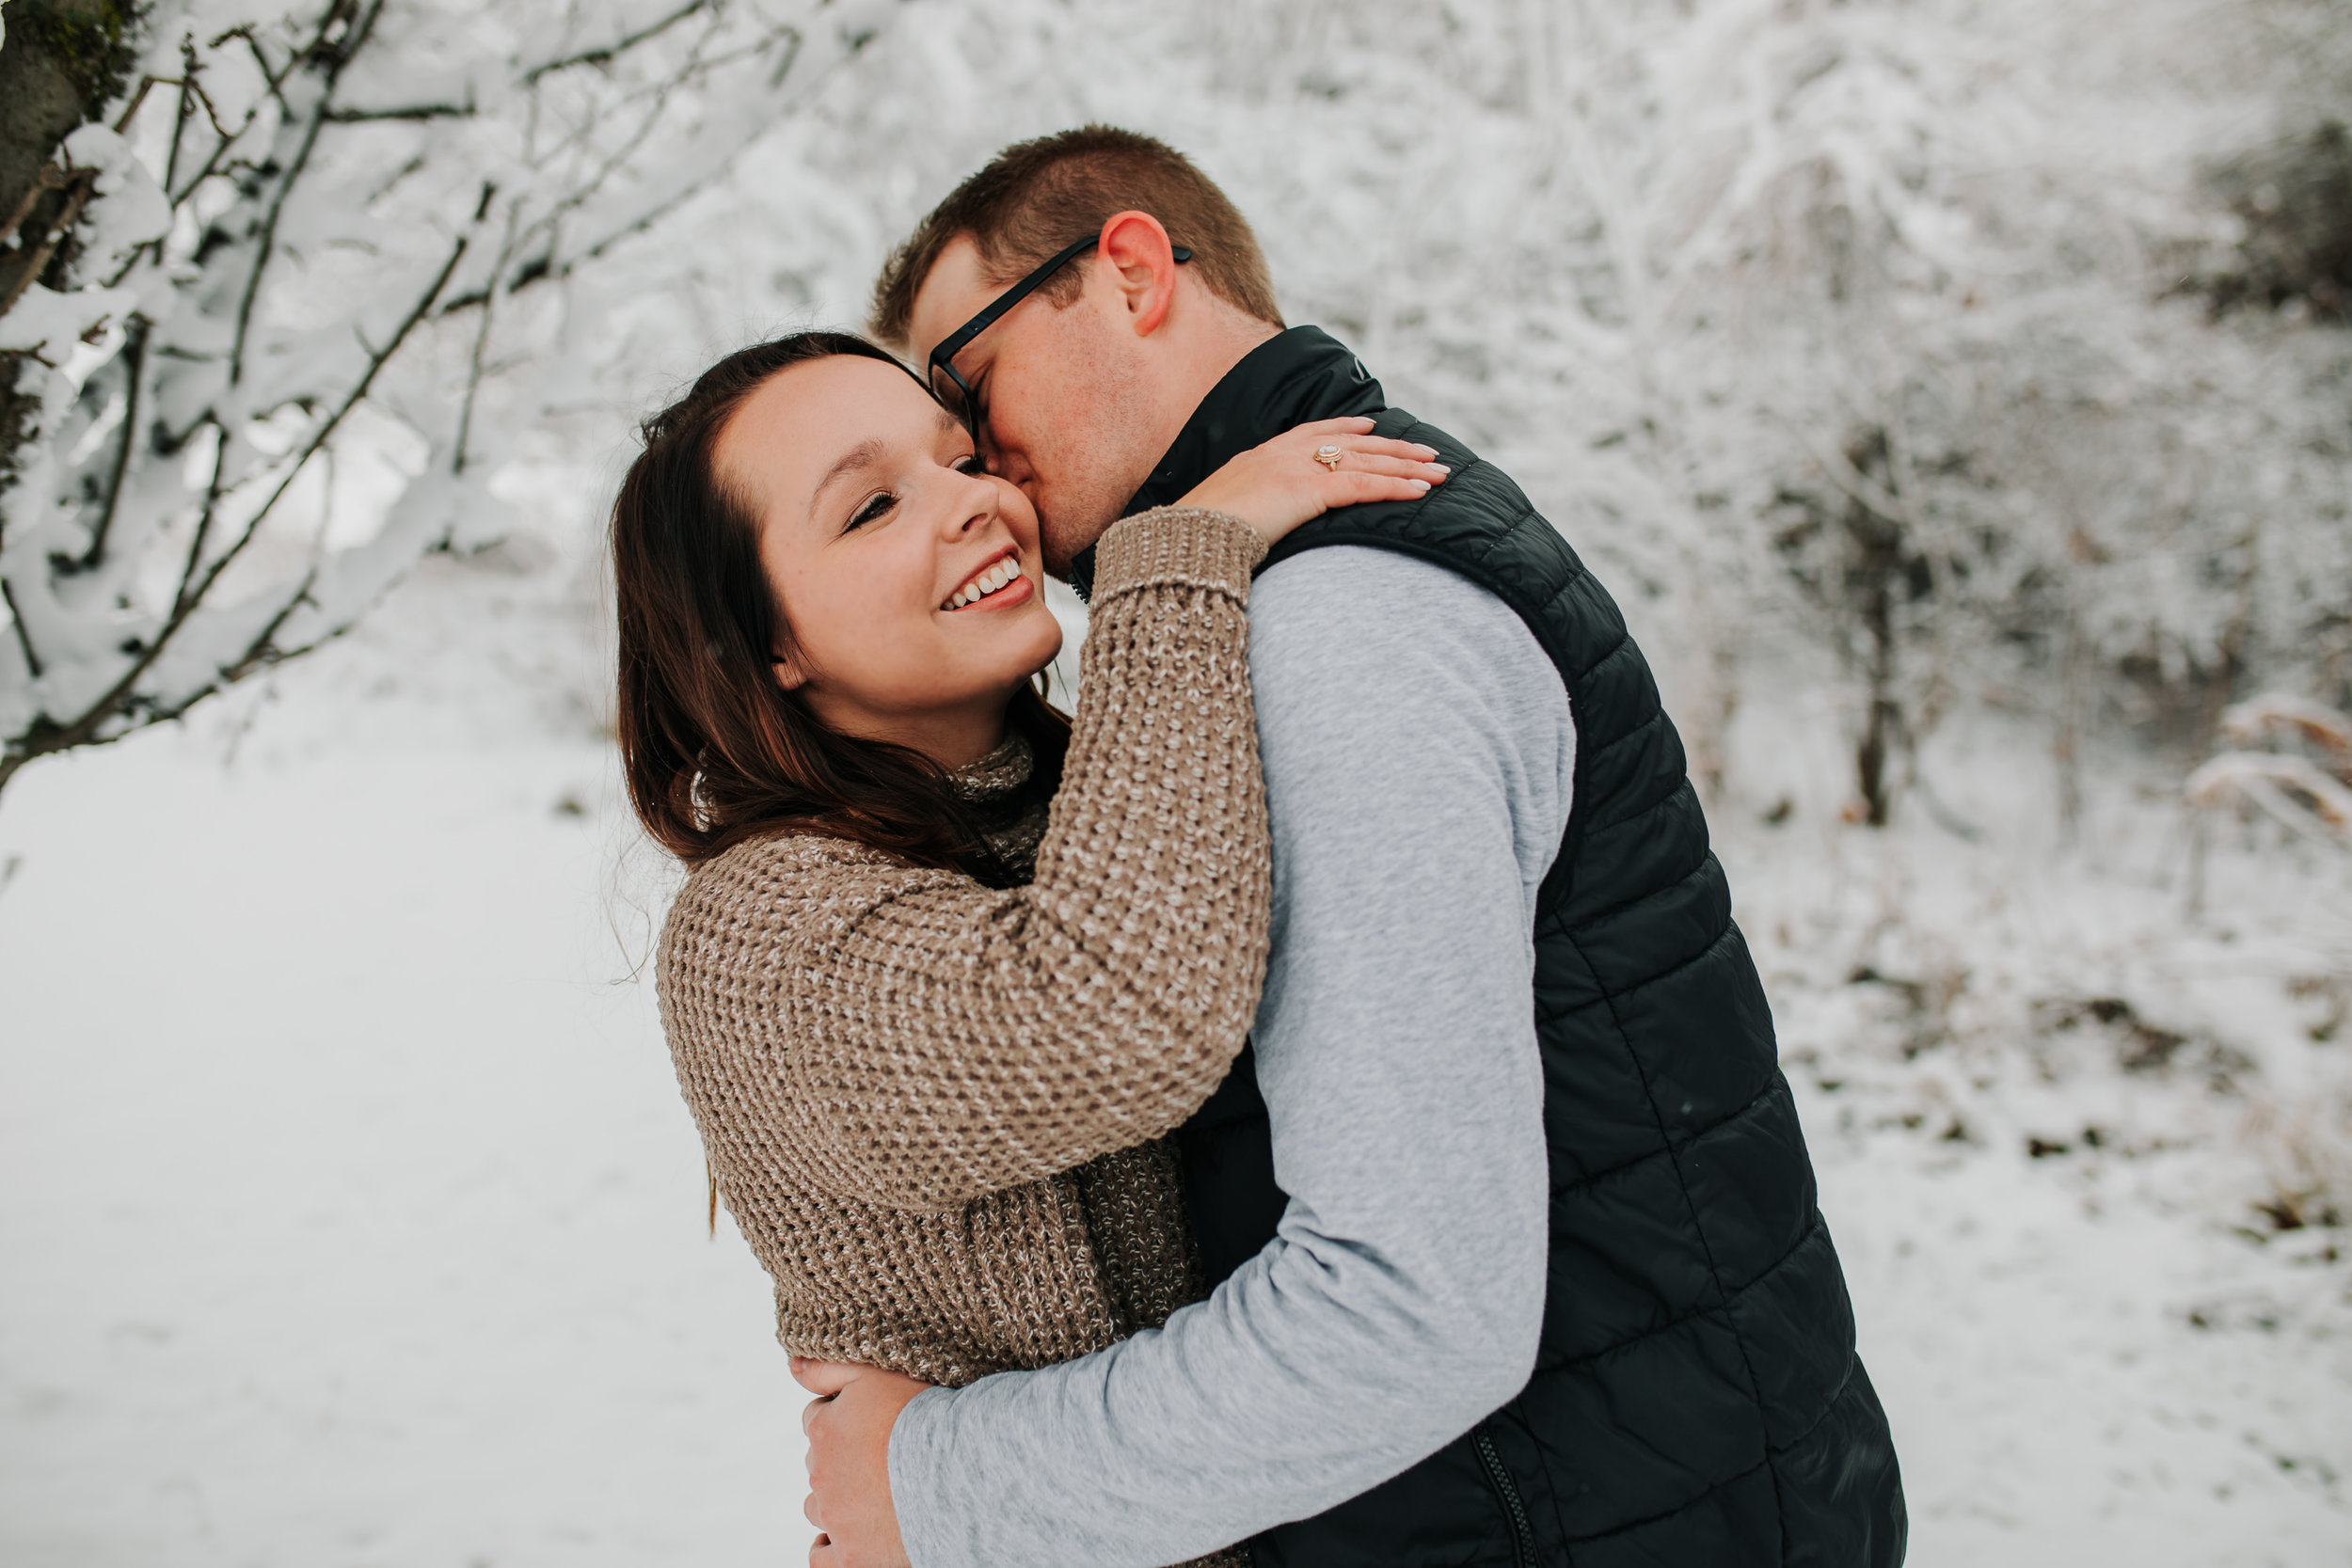 Vanessa & Dan - Engaged - Nathaniel Jensen Photography - Omaha Nebraska Wedding Photographer - Standing Bear Lake - Snowy Engagement Session-26.jpg